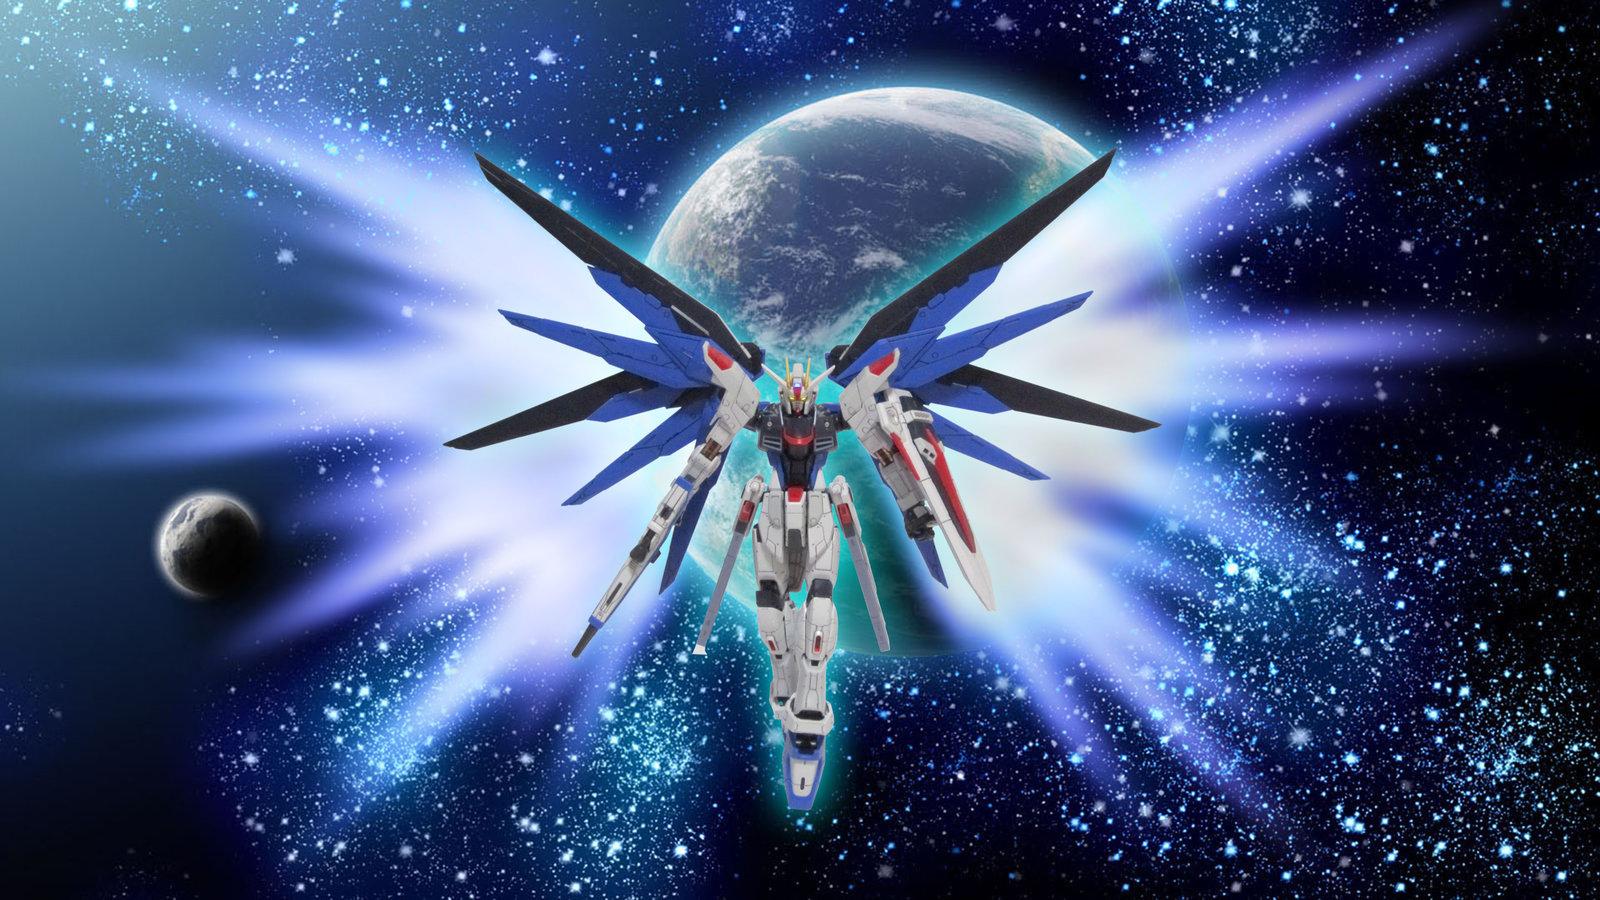 Freedom Gundam by RepX105 1600x900